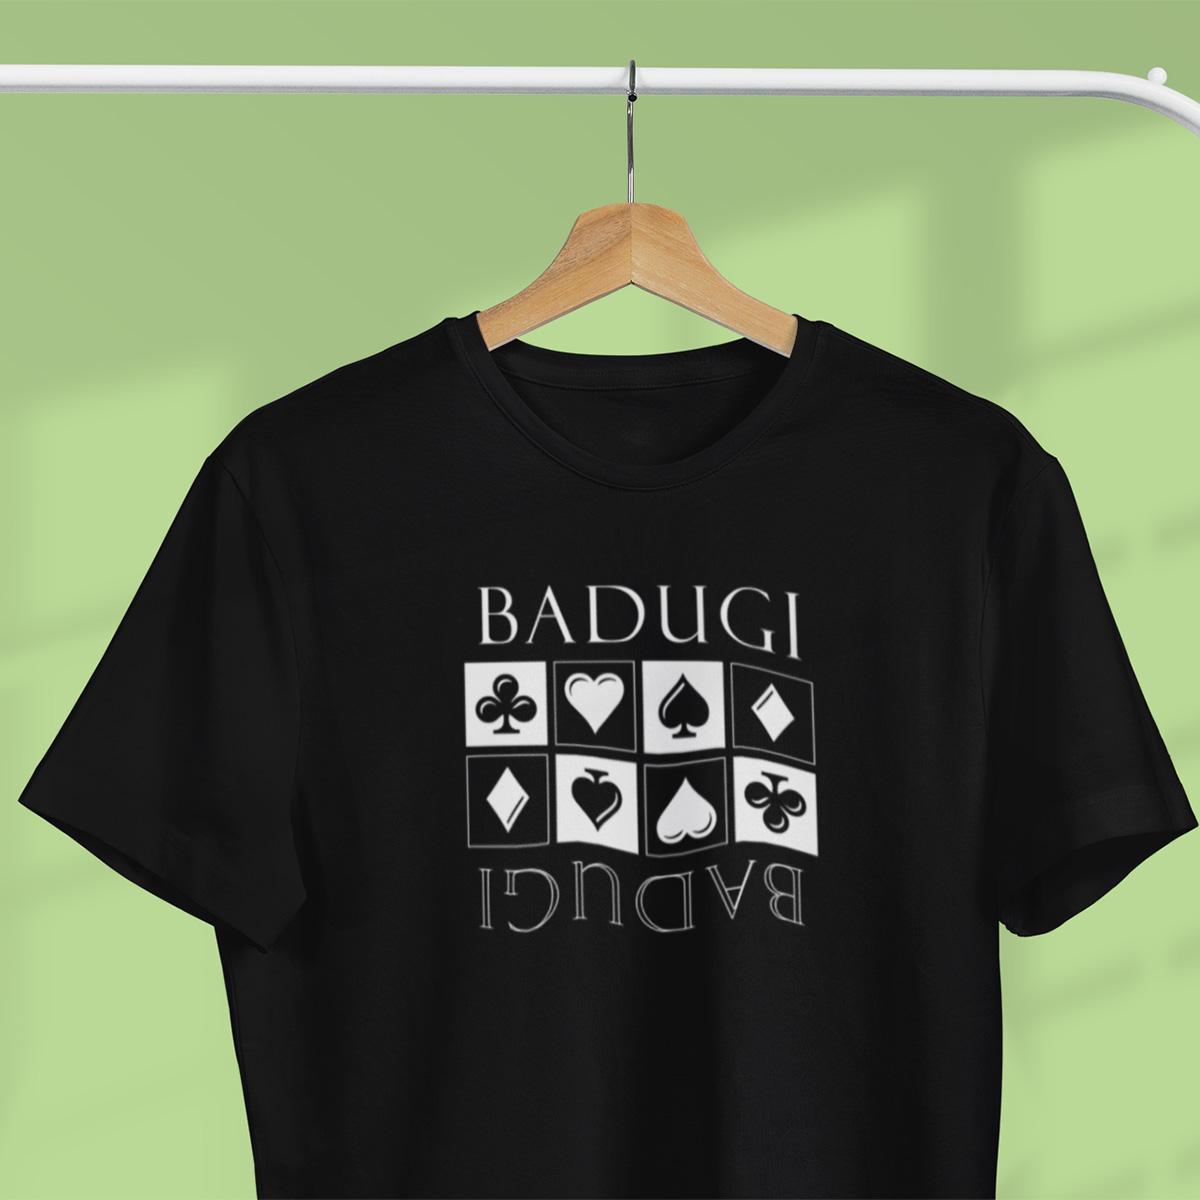 Badugi PokerT-Shirt